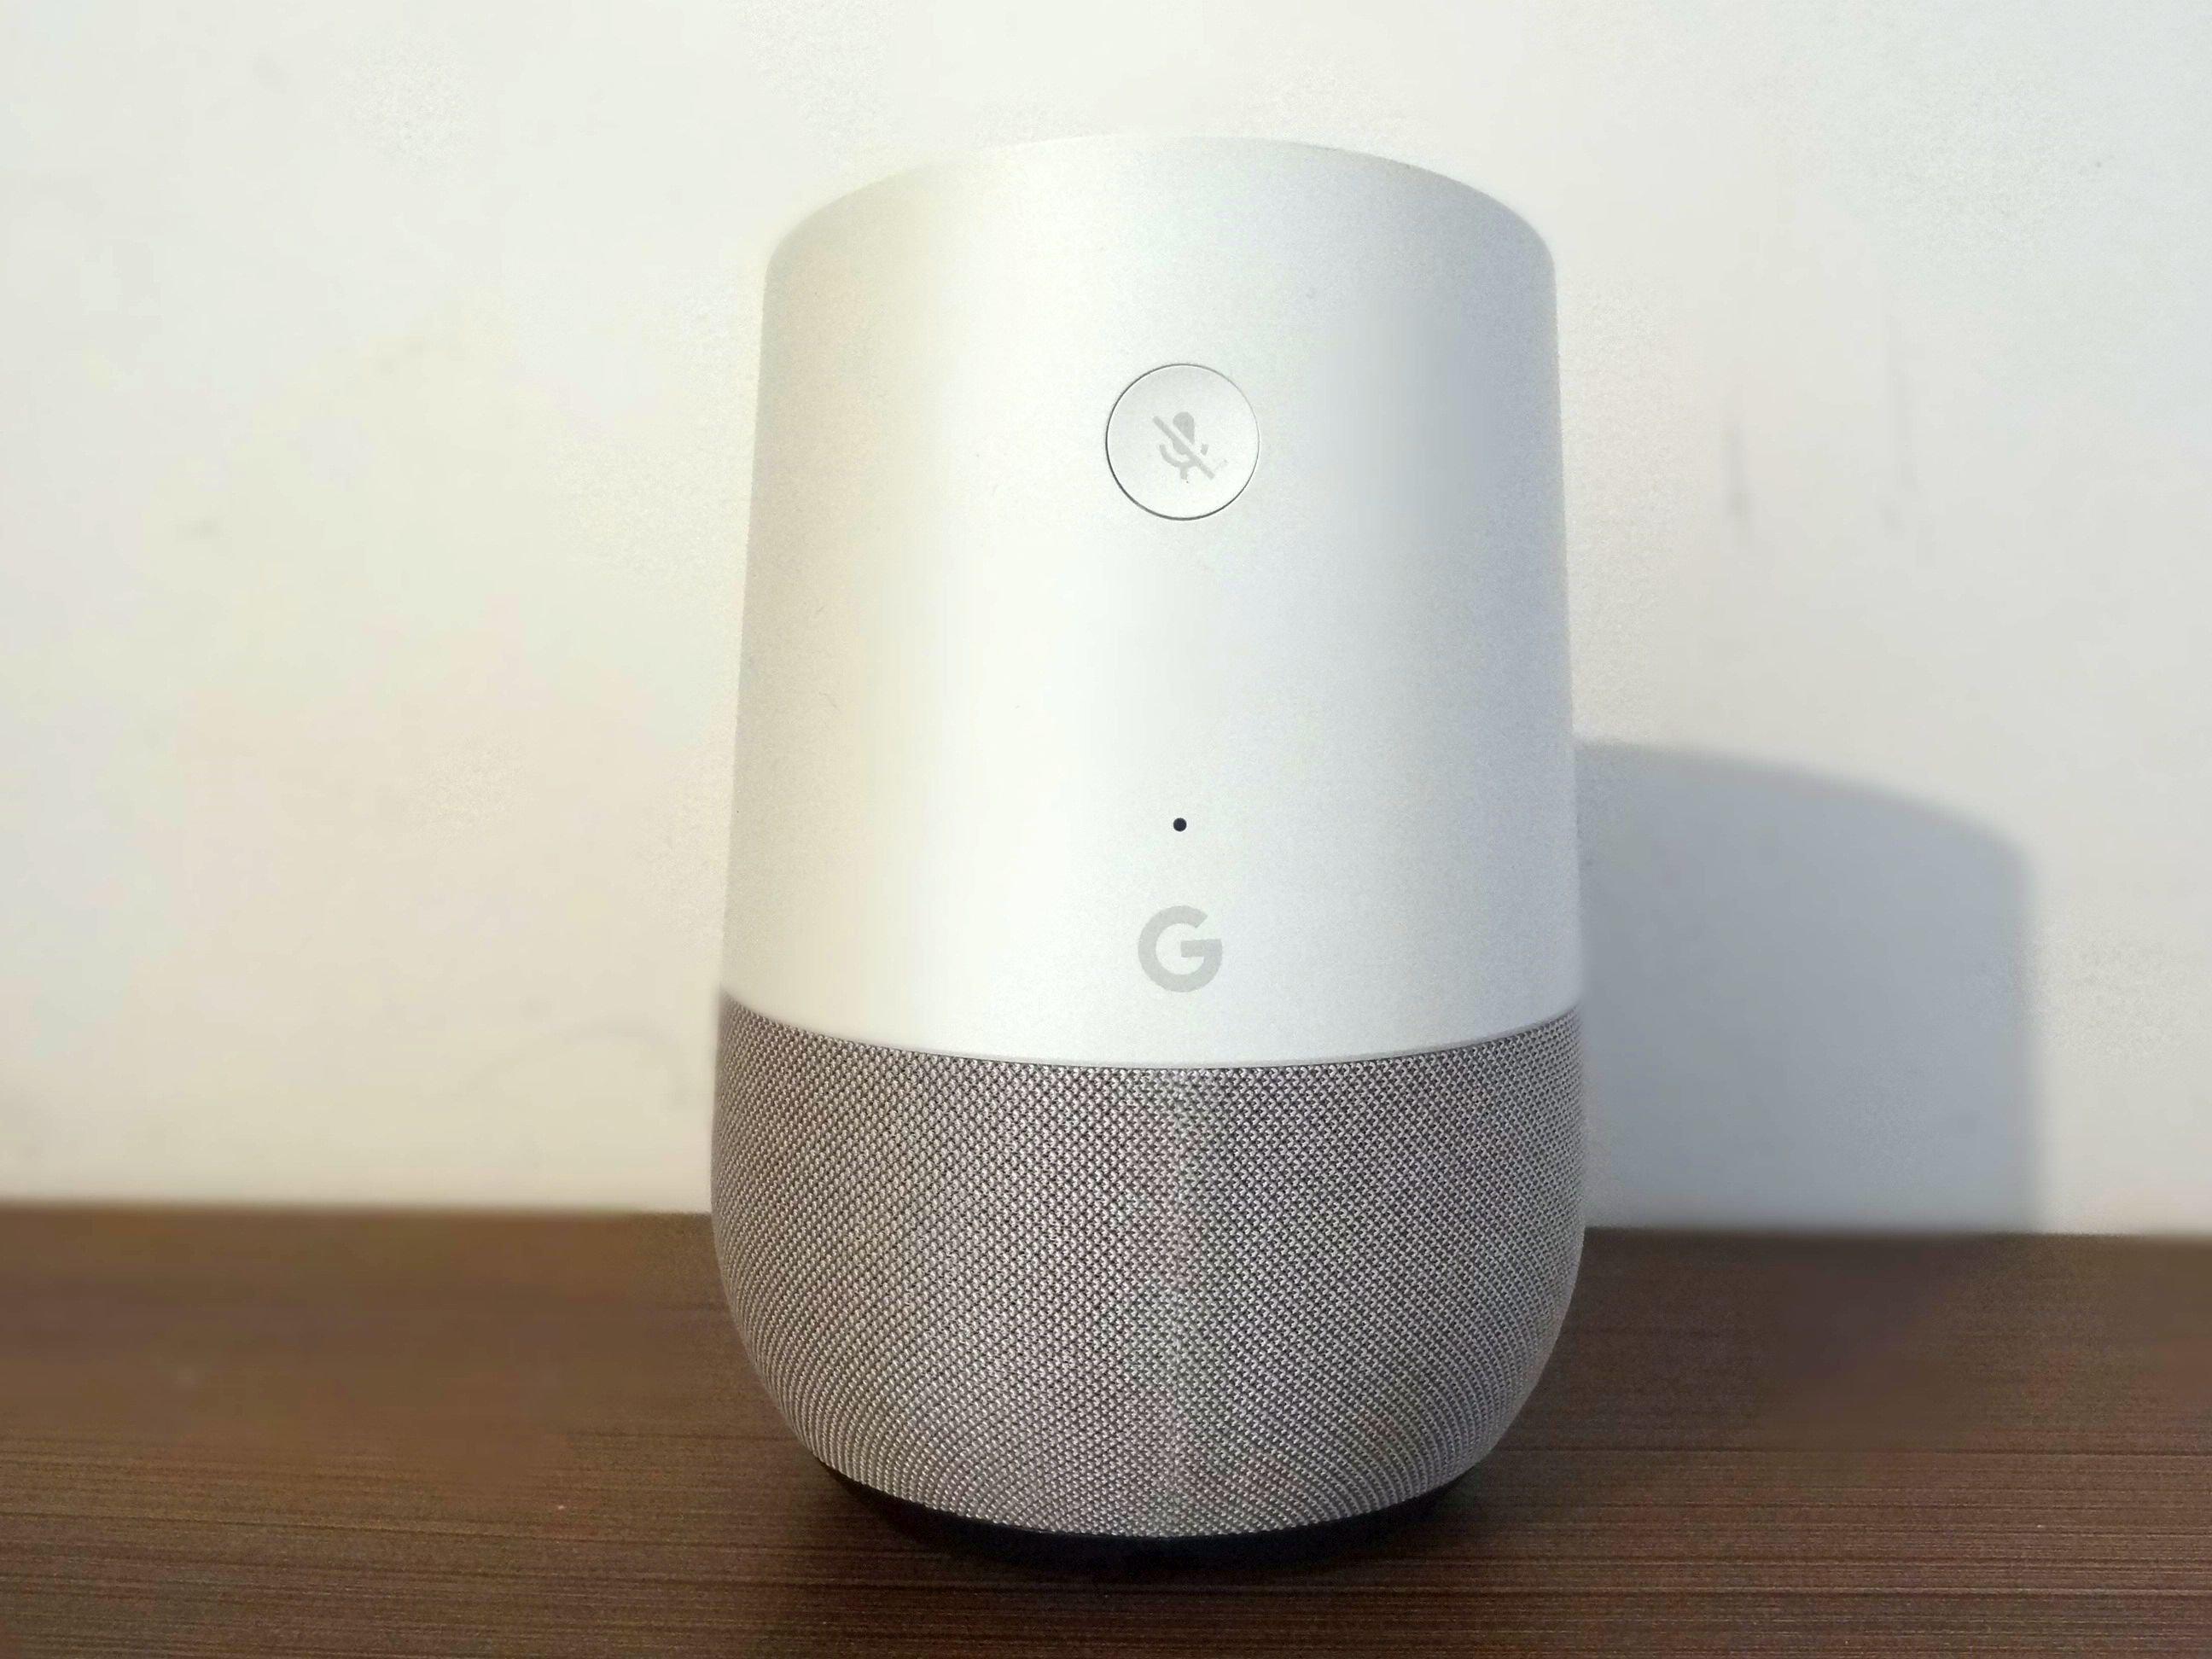 Google Home - inteligentny głośnik Google